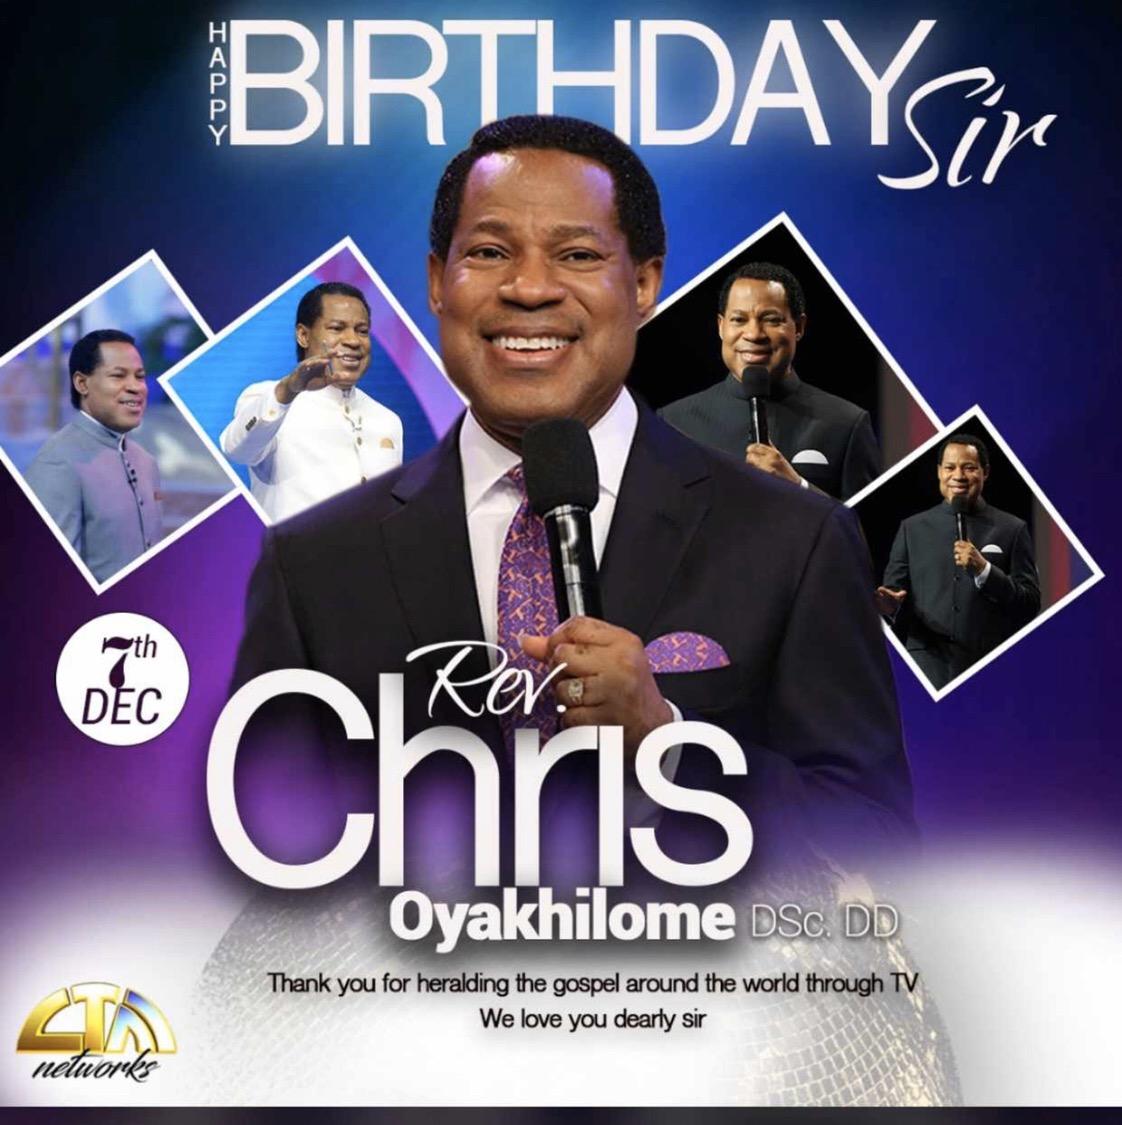 Happy birthday Pastor Chris, my